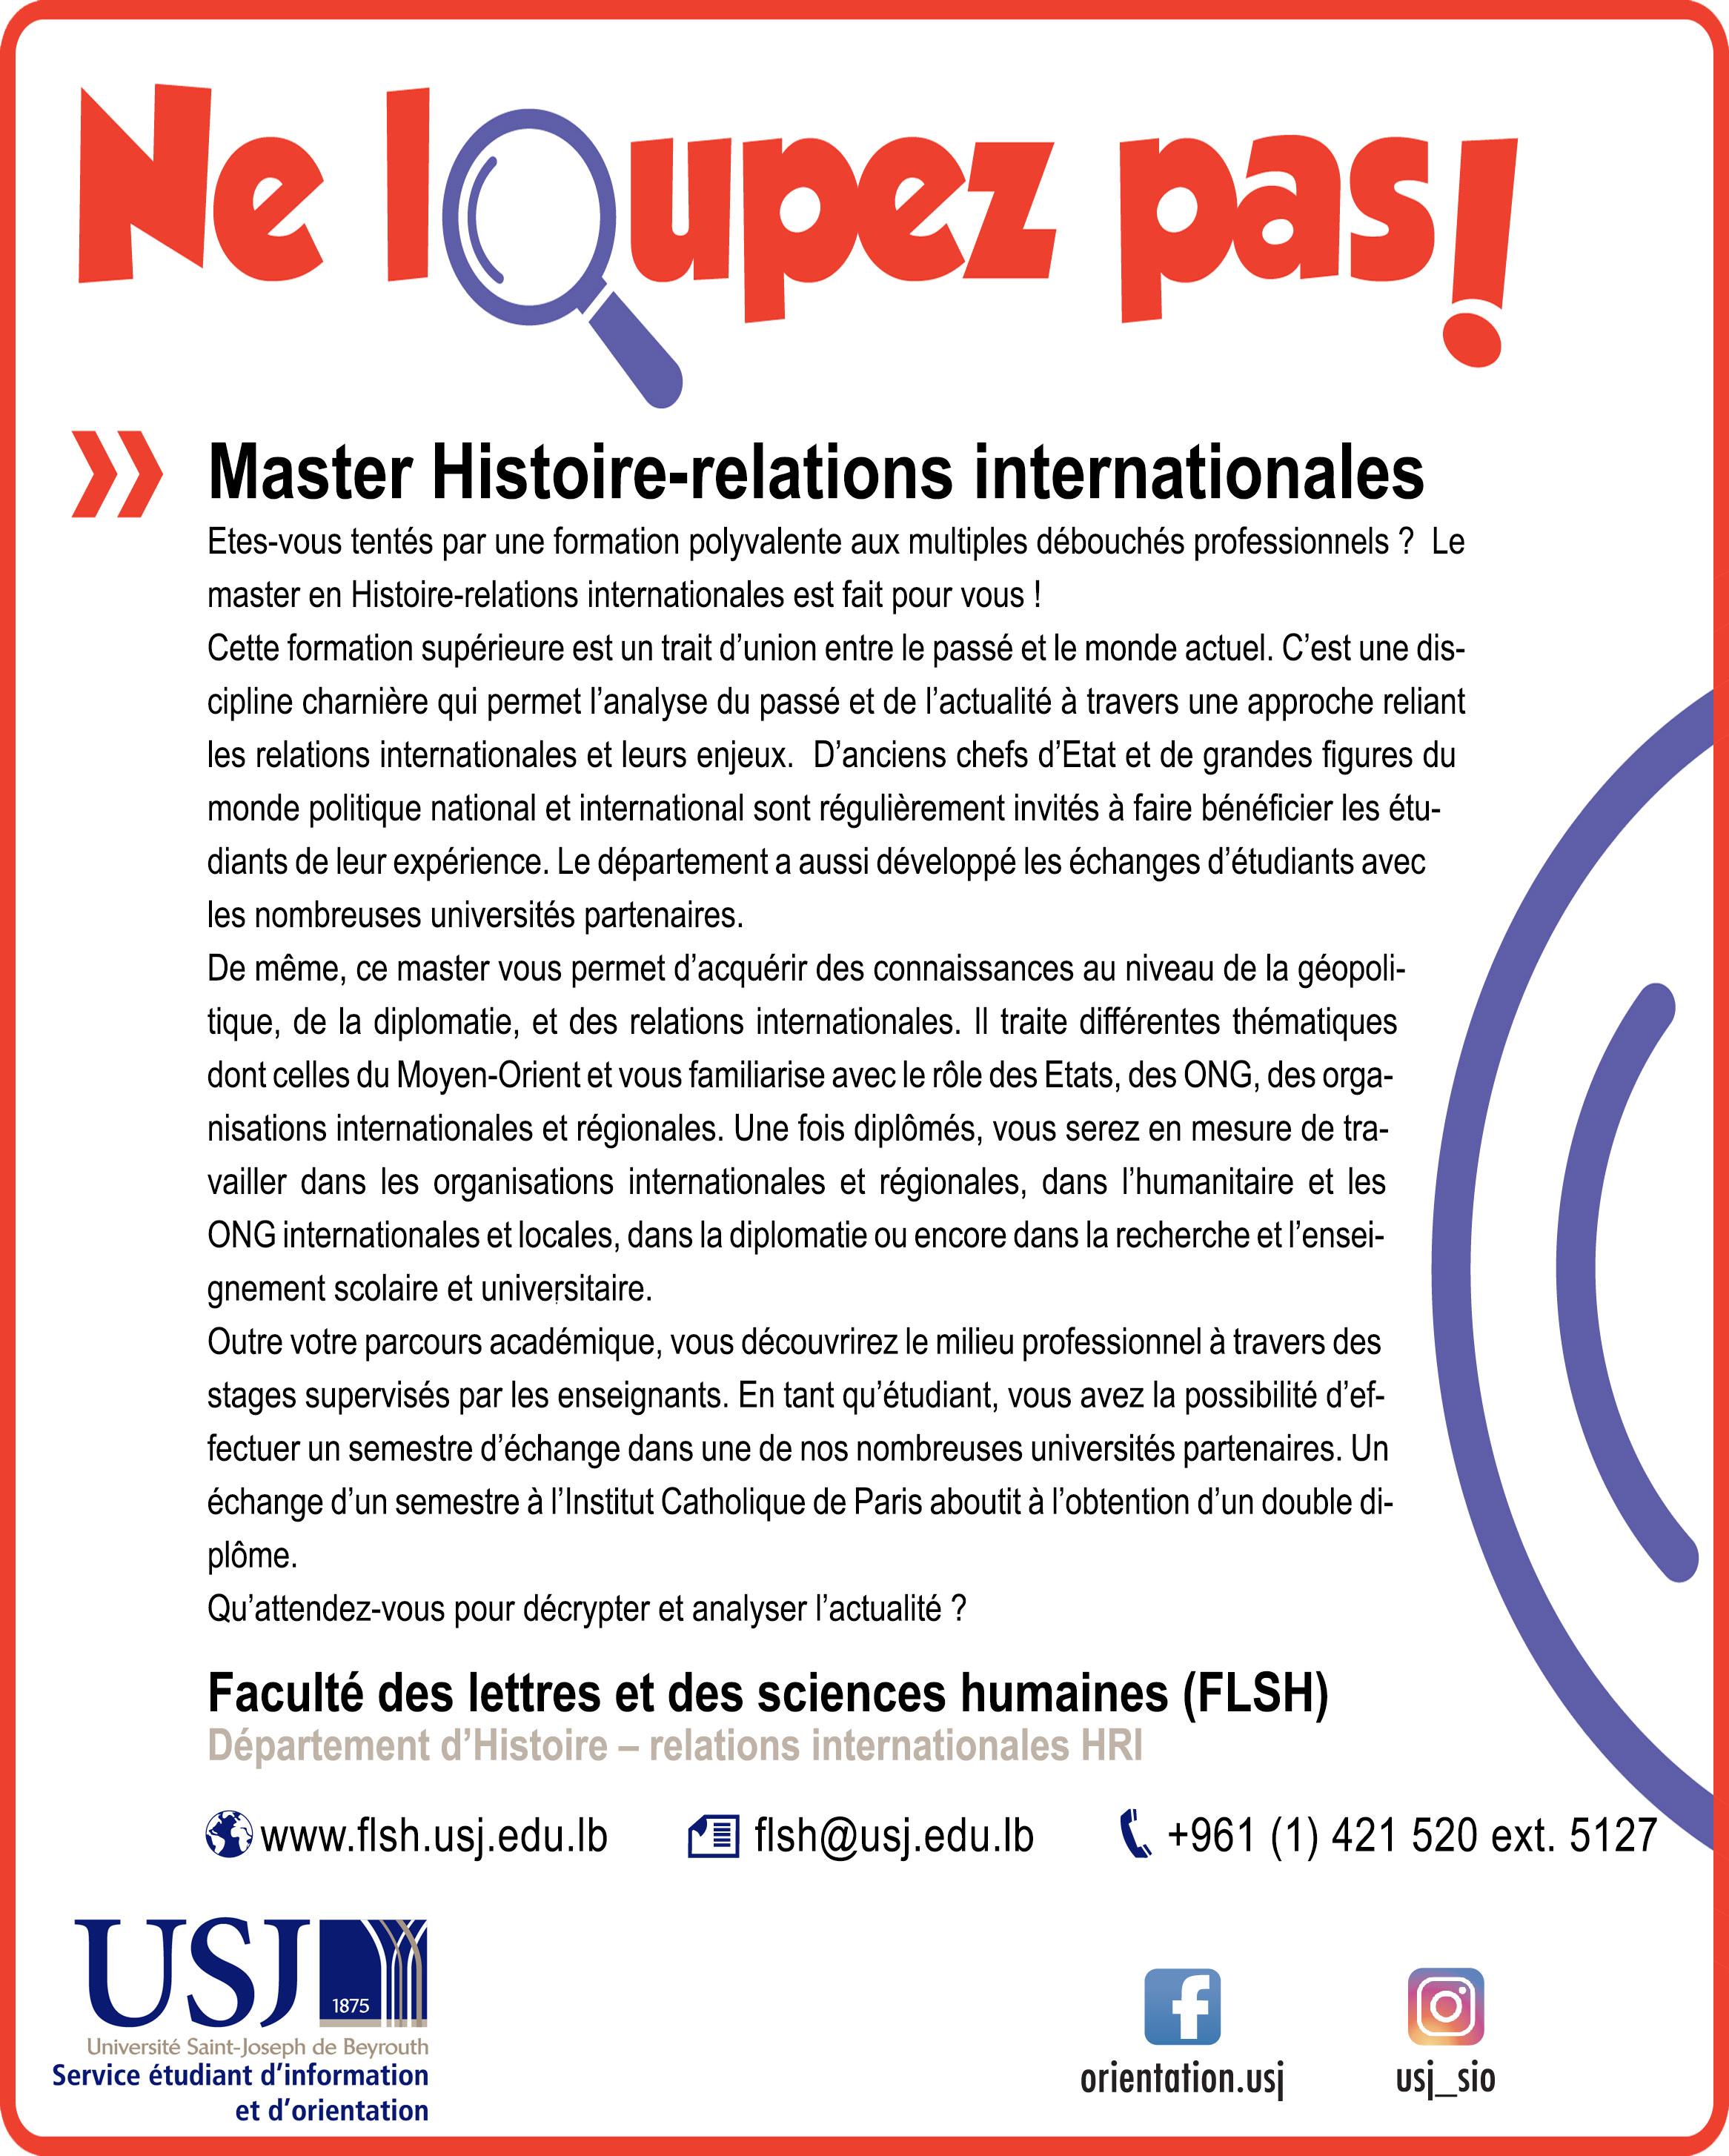 Master Histoire-relations internationales